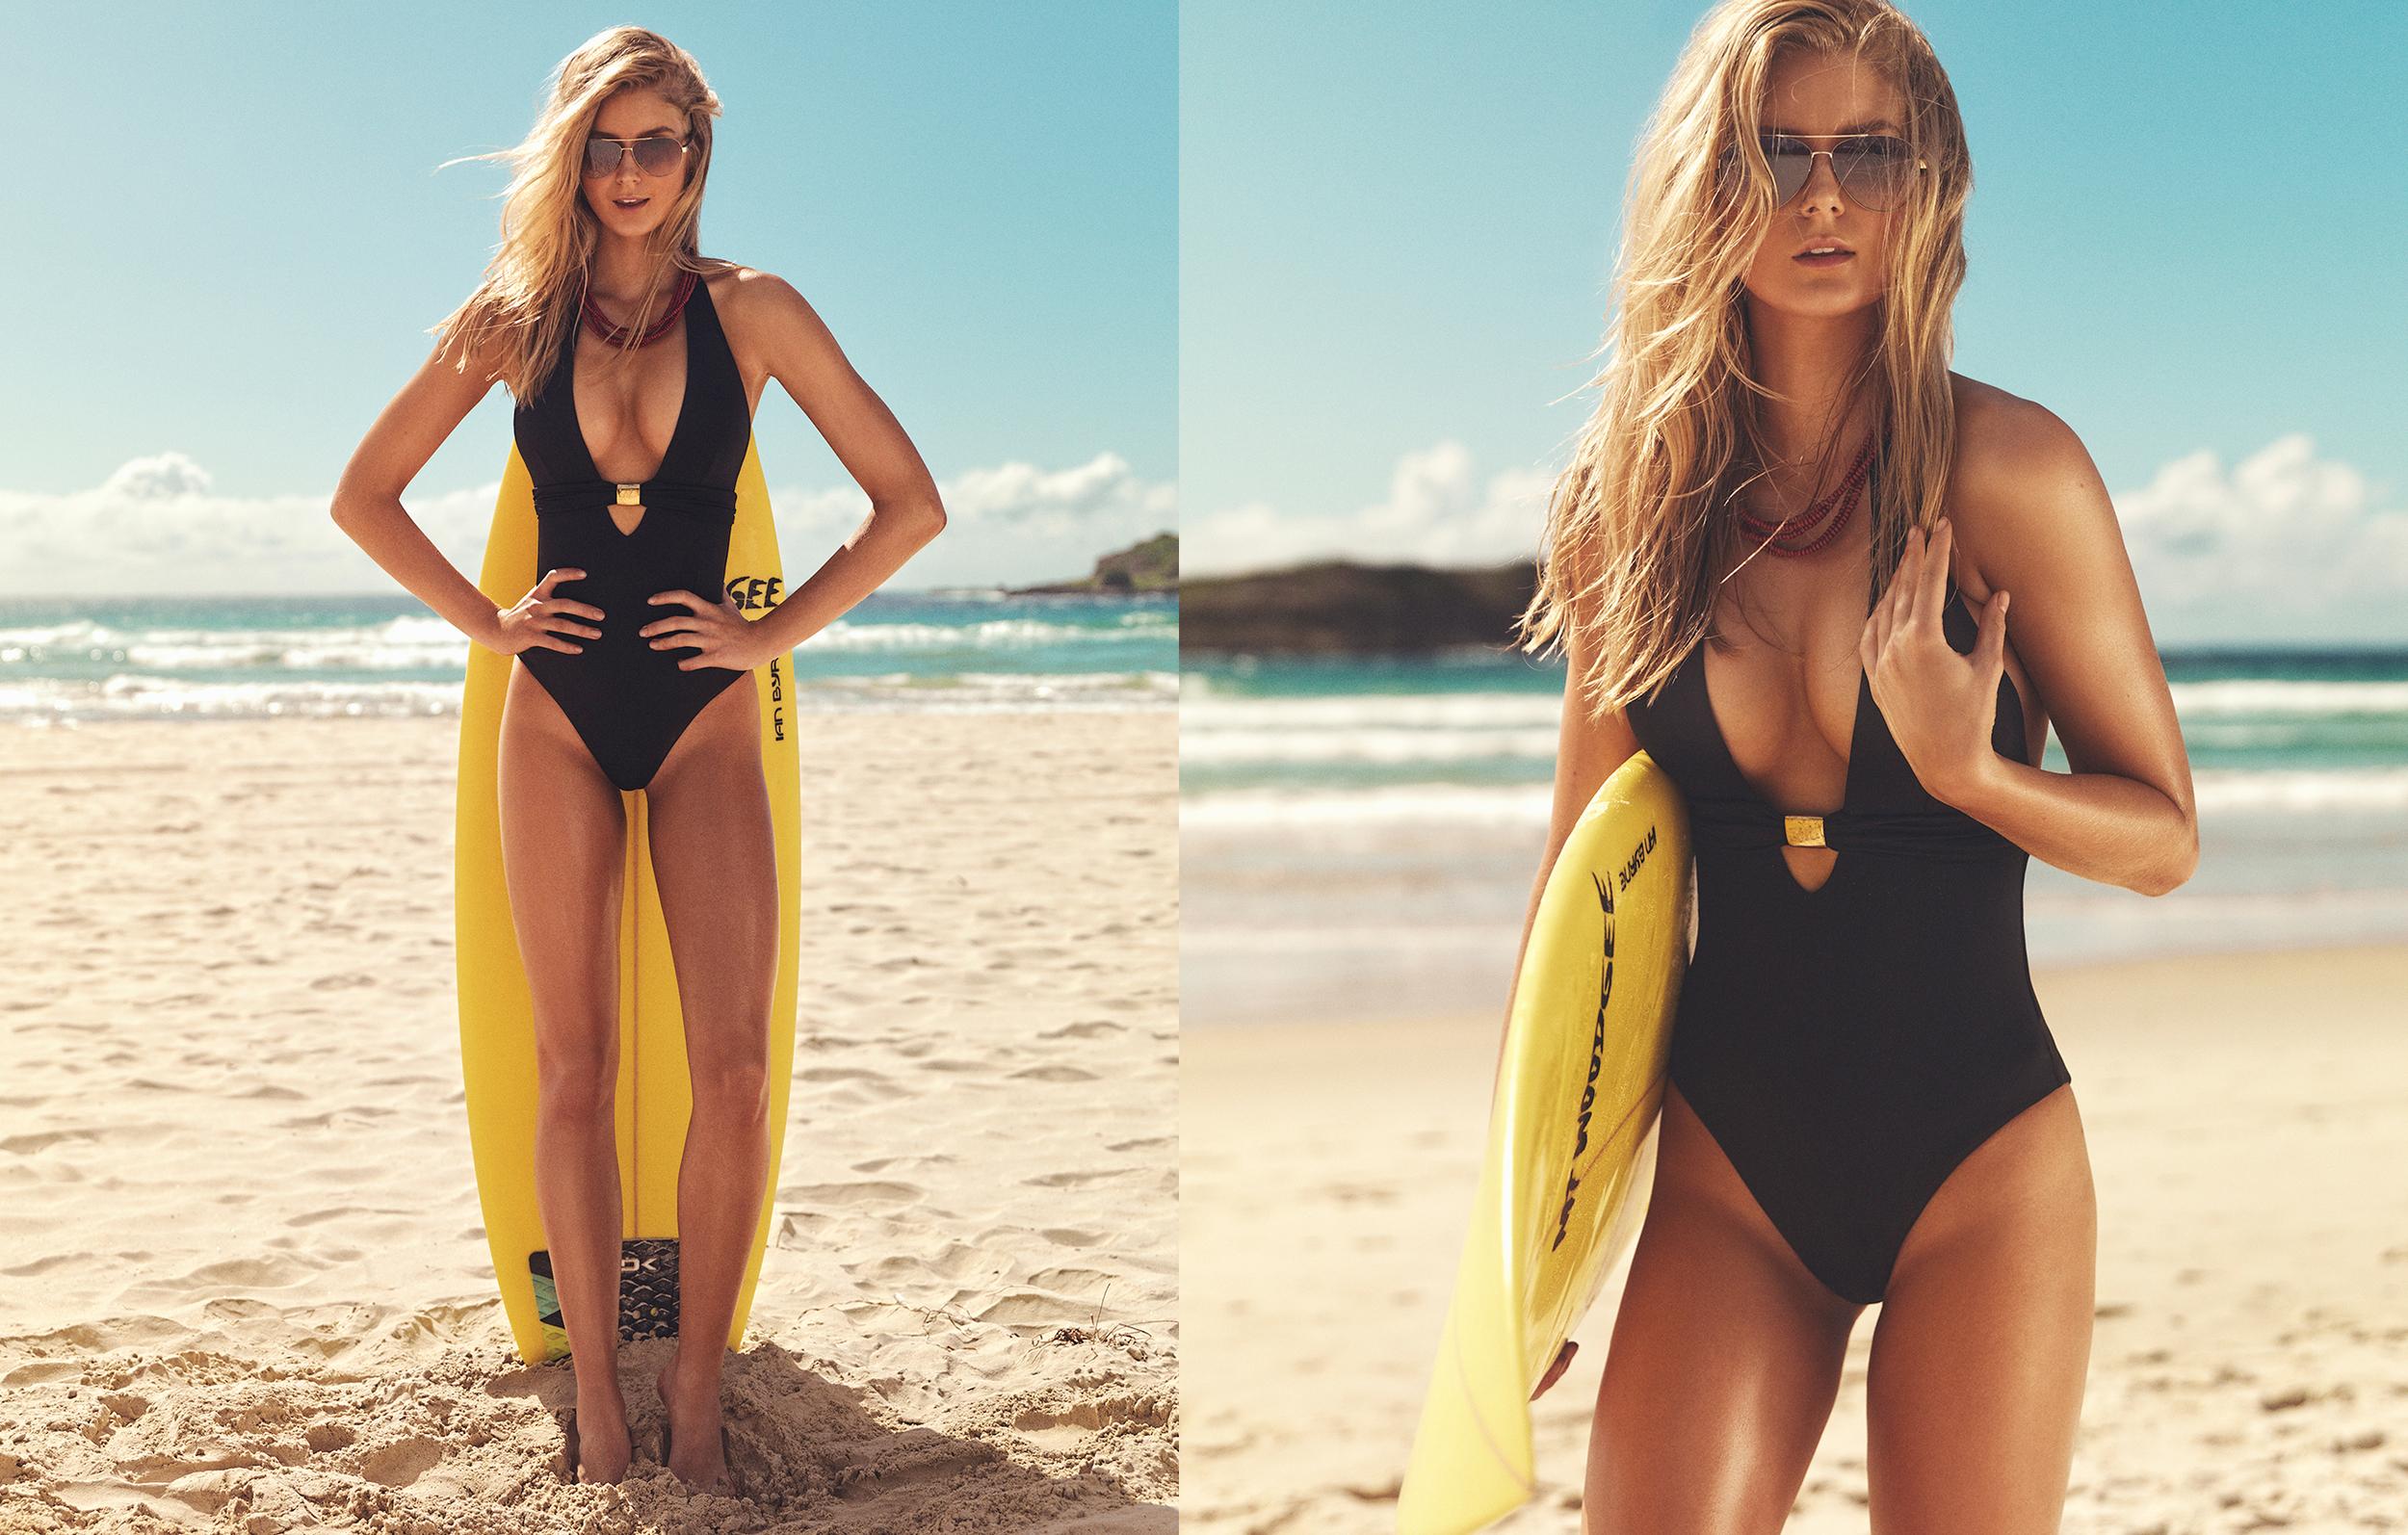 Chelsea-Moody-Dallys-Models-Photographer-Mark-SullivanBradley-Brisbane.jpg